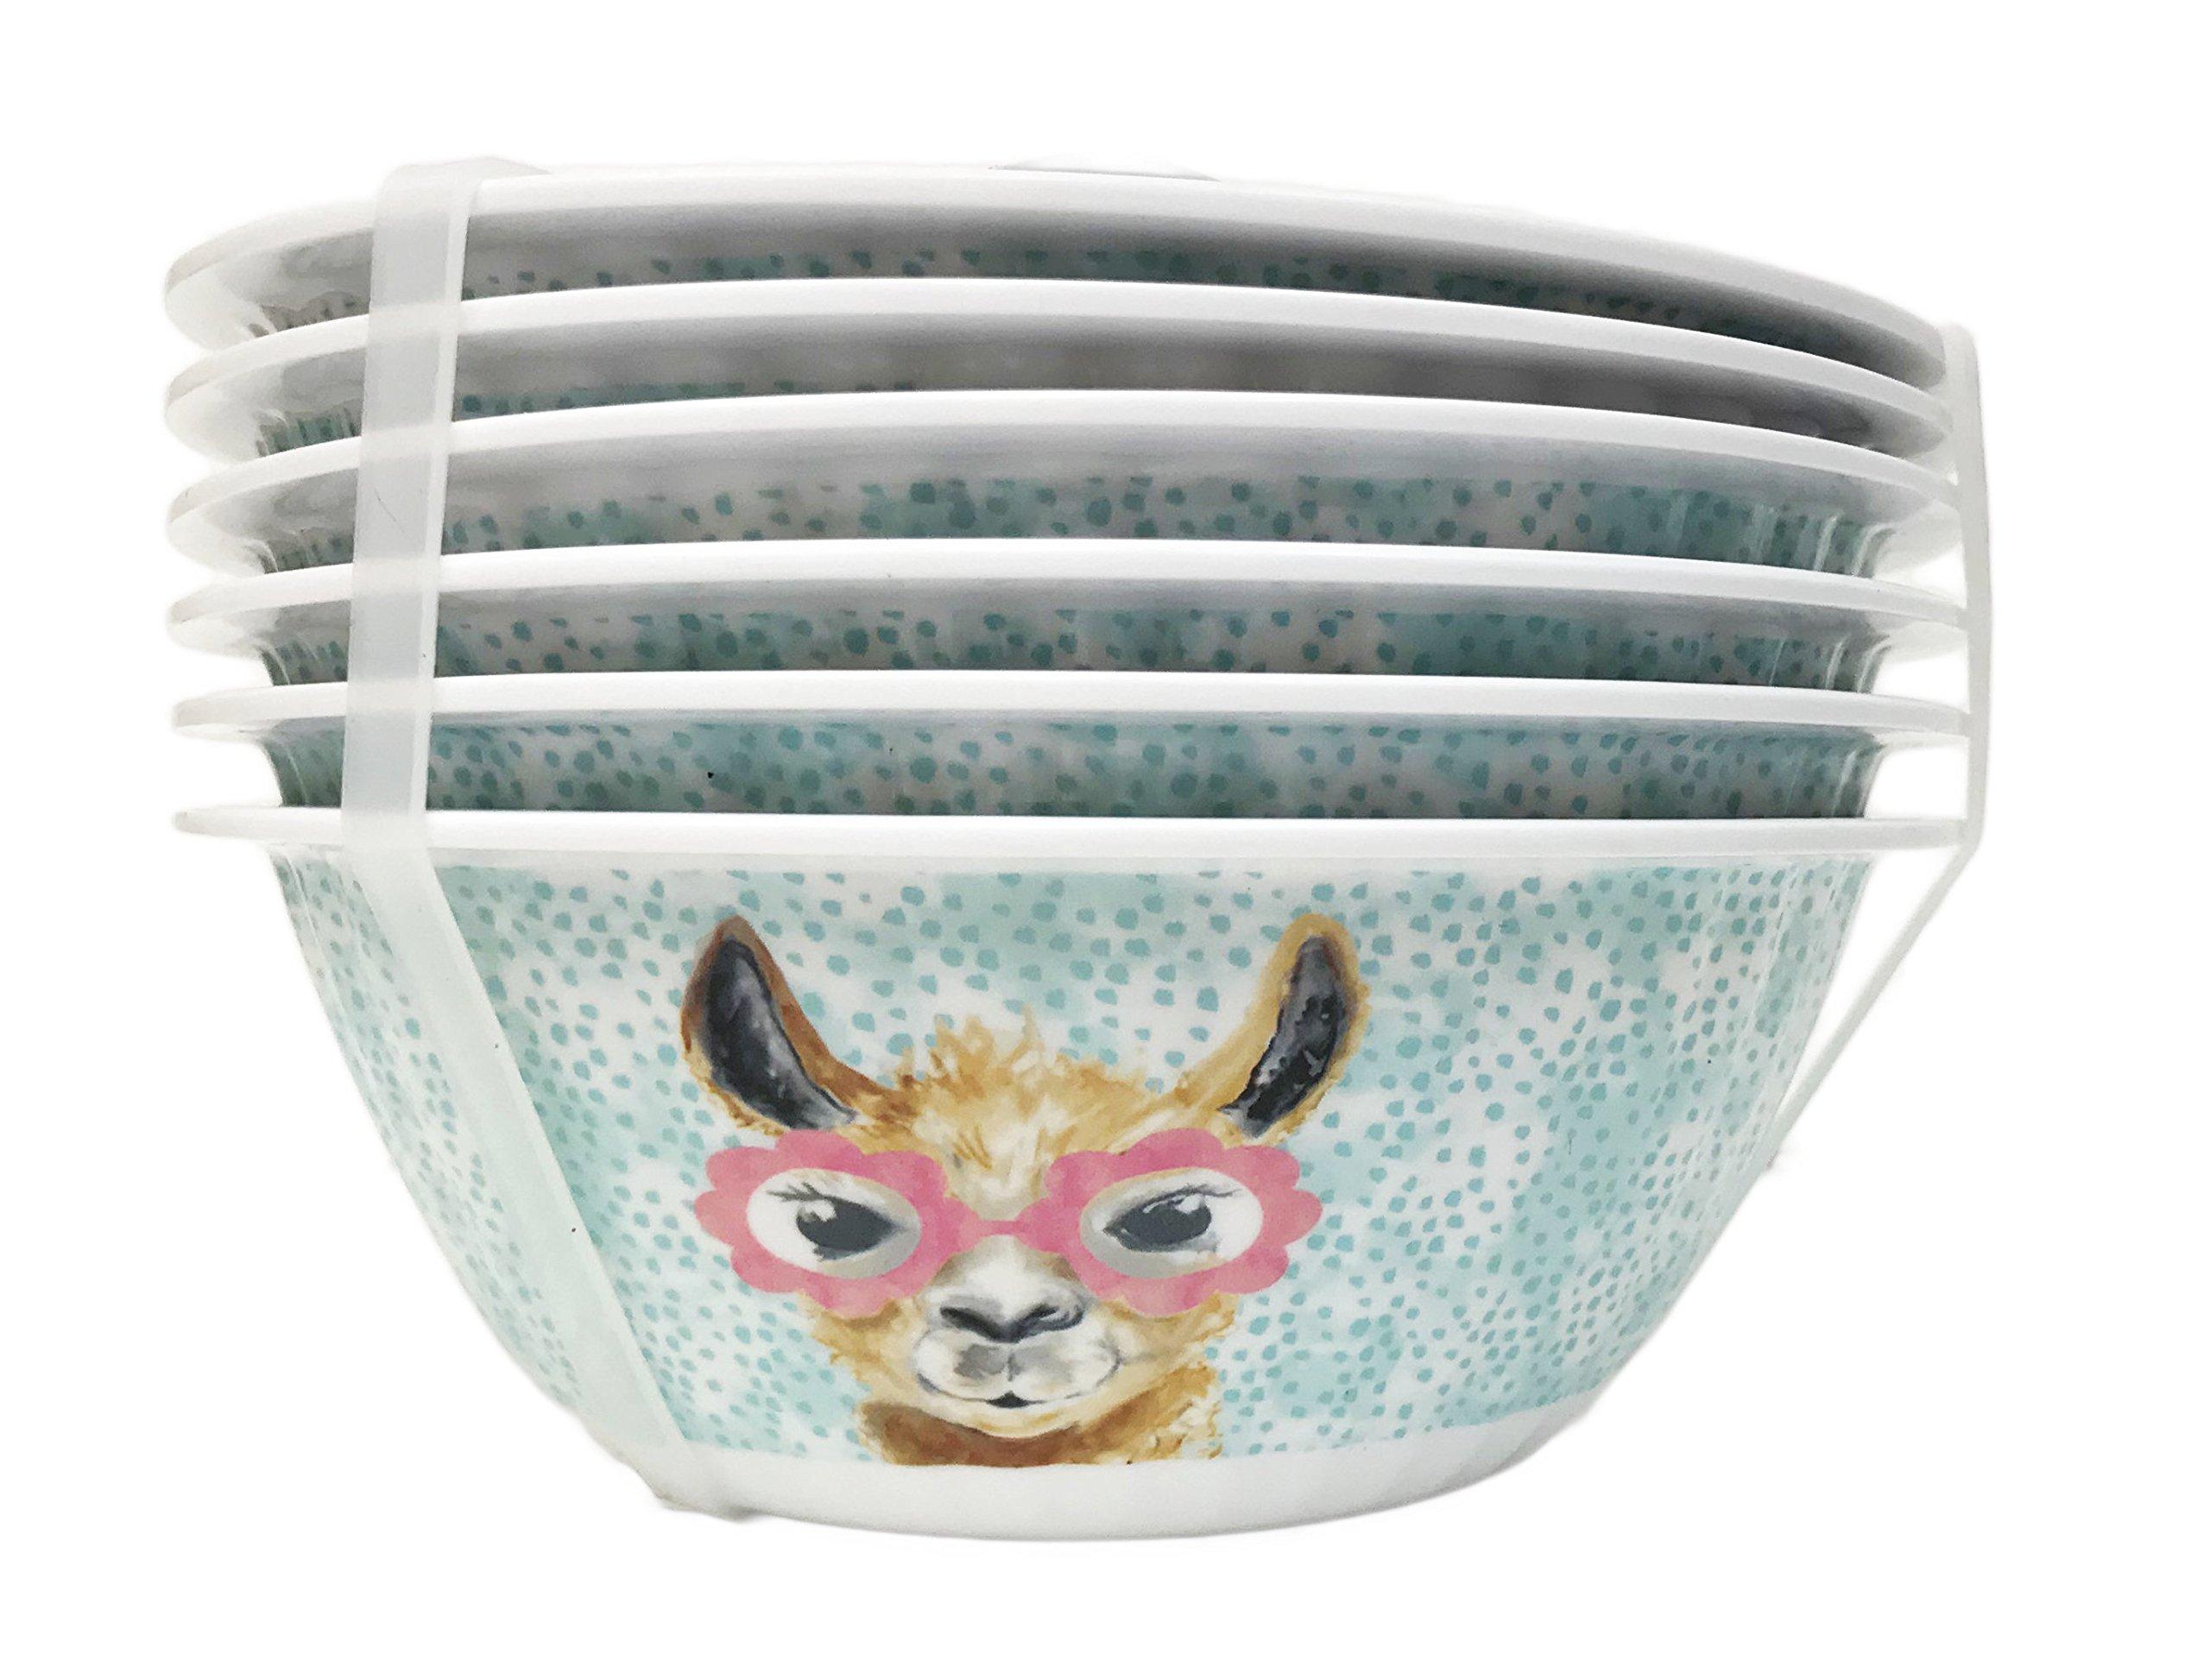 Cute Llama Face Wearing Pink Flower Eyeglasses Set of 6 Melamine Dipping Appetizer Snack Dessert Bowls